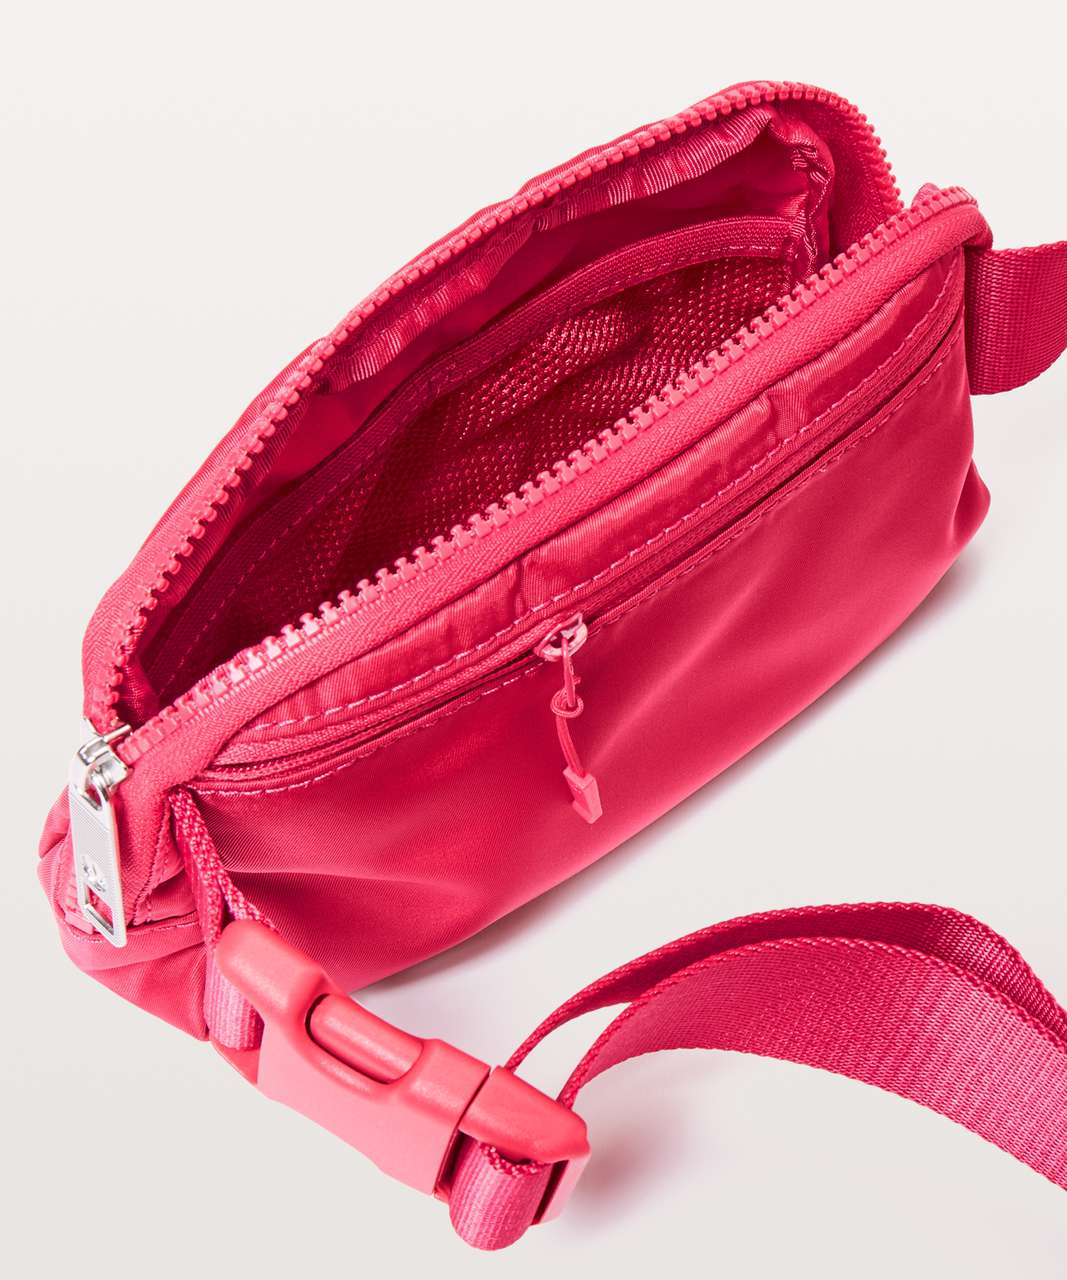 Lululemon Everywhere Belt Bag *1L - Fuchsia Pink